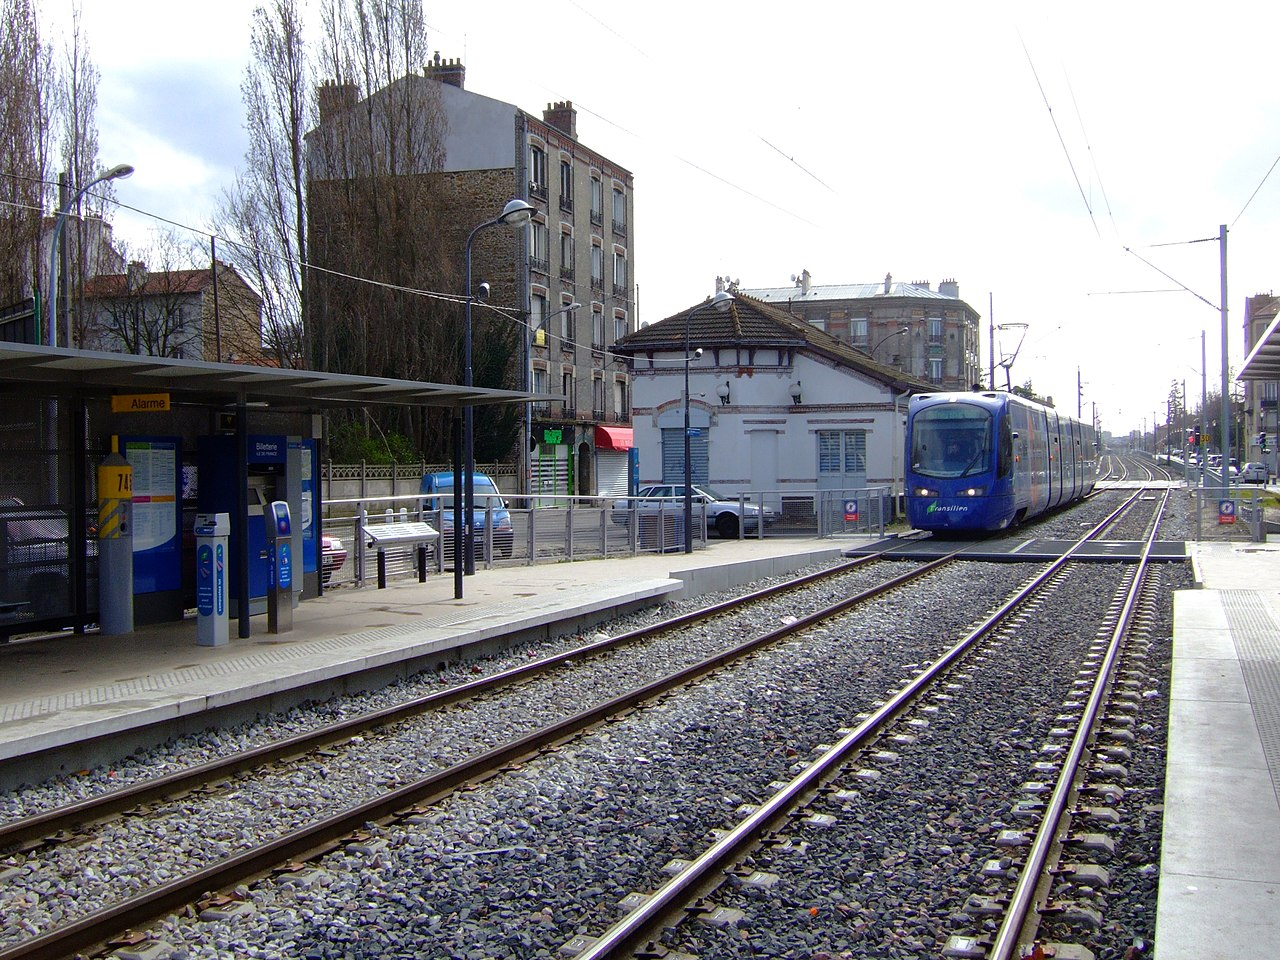 Matmut Pavillons Sous Bois - File Tram station, Les Pavillons sous Bois fr 01 jpg Wikimedia Commons